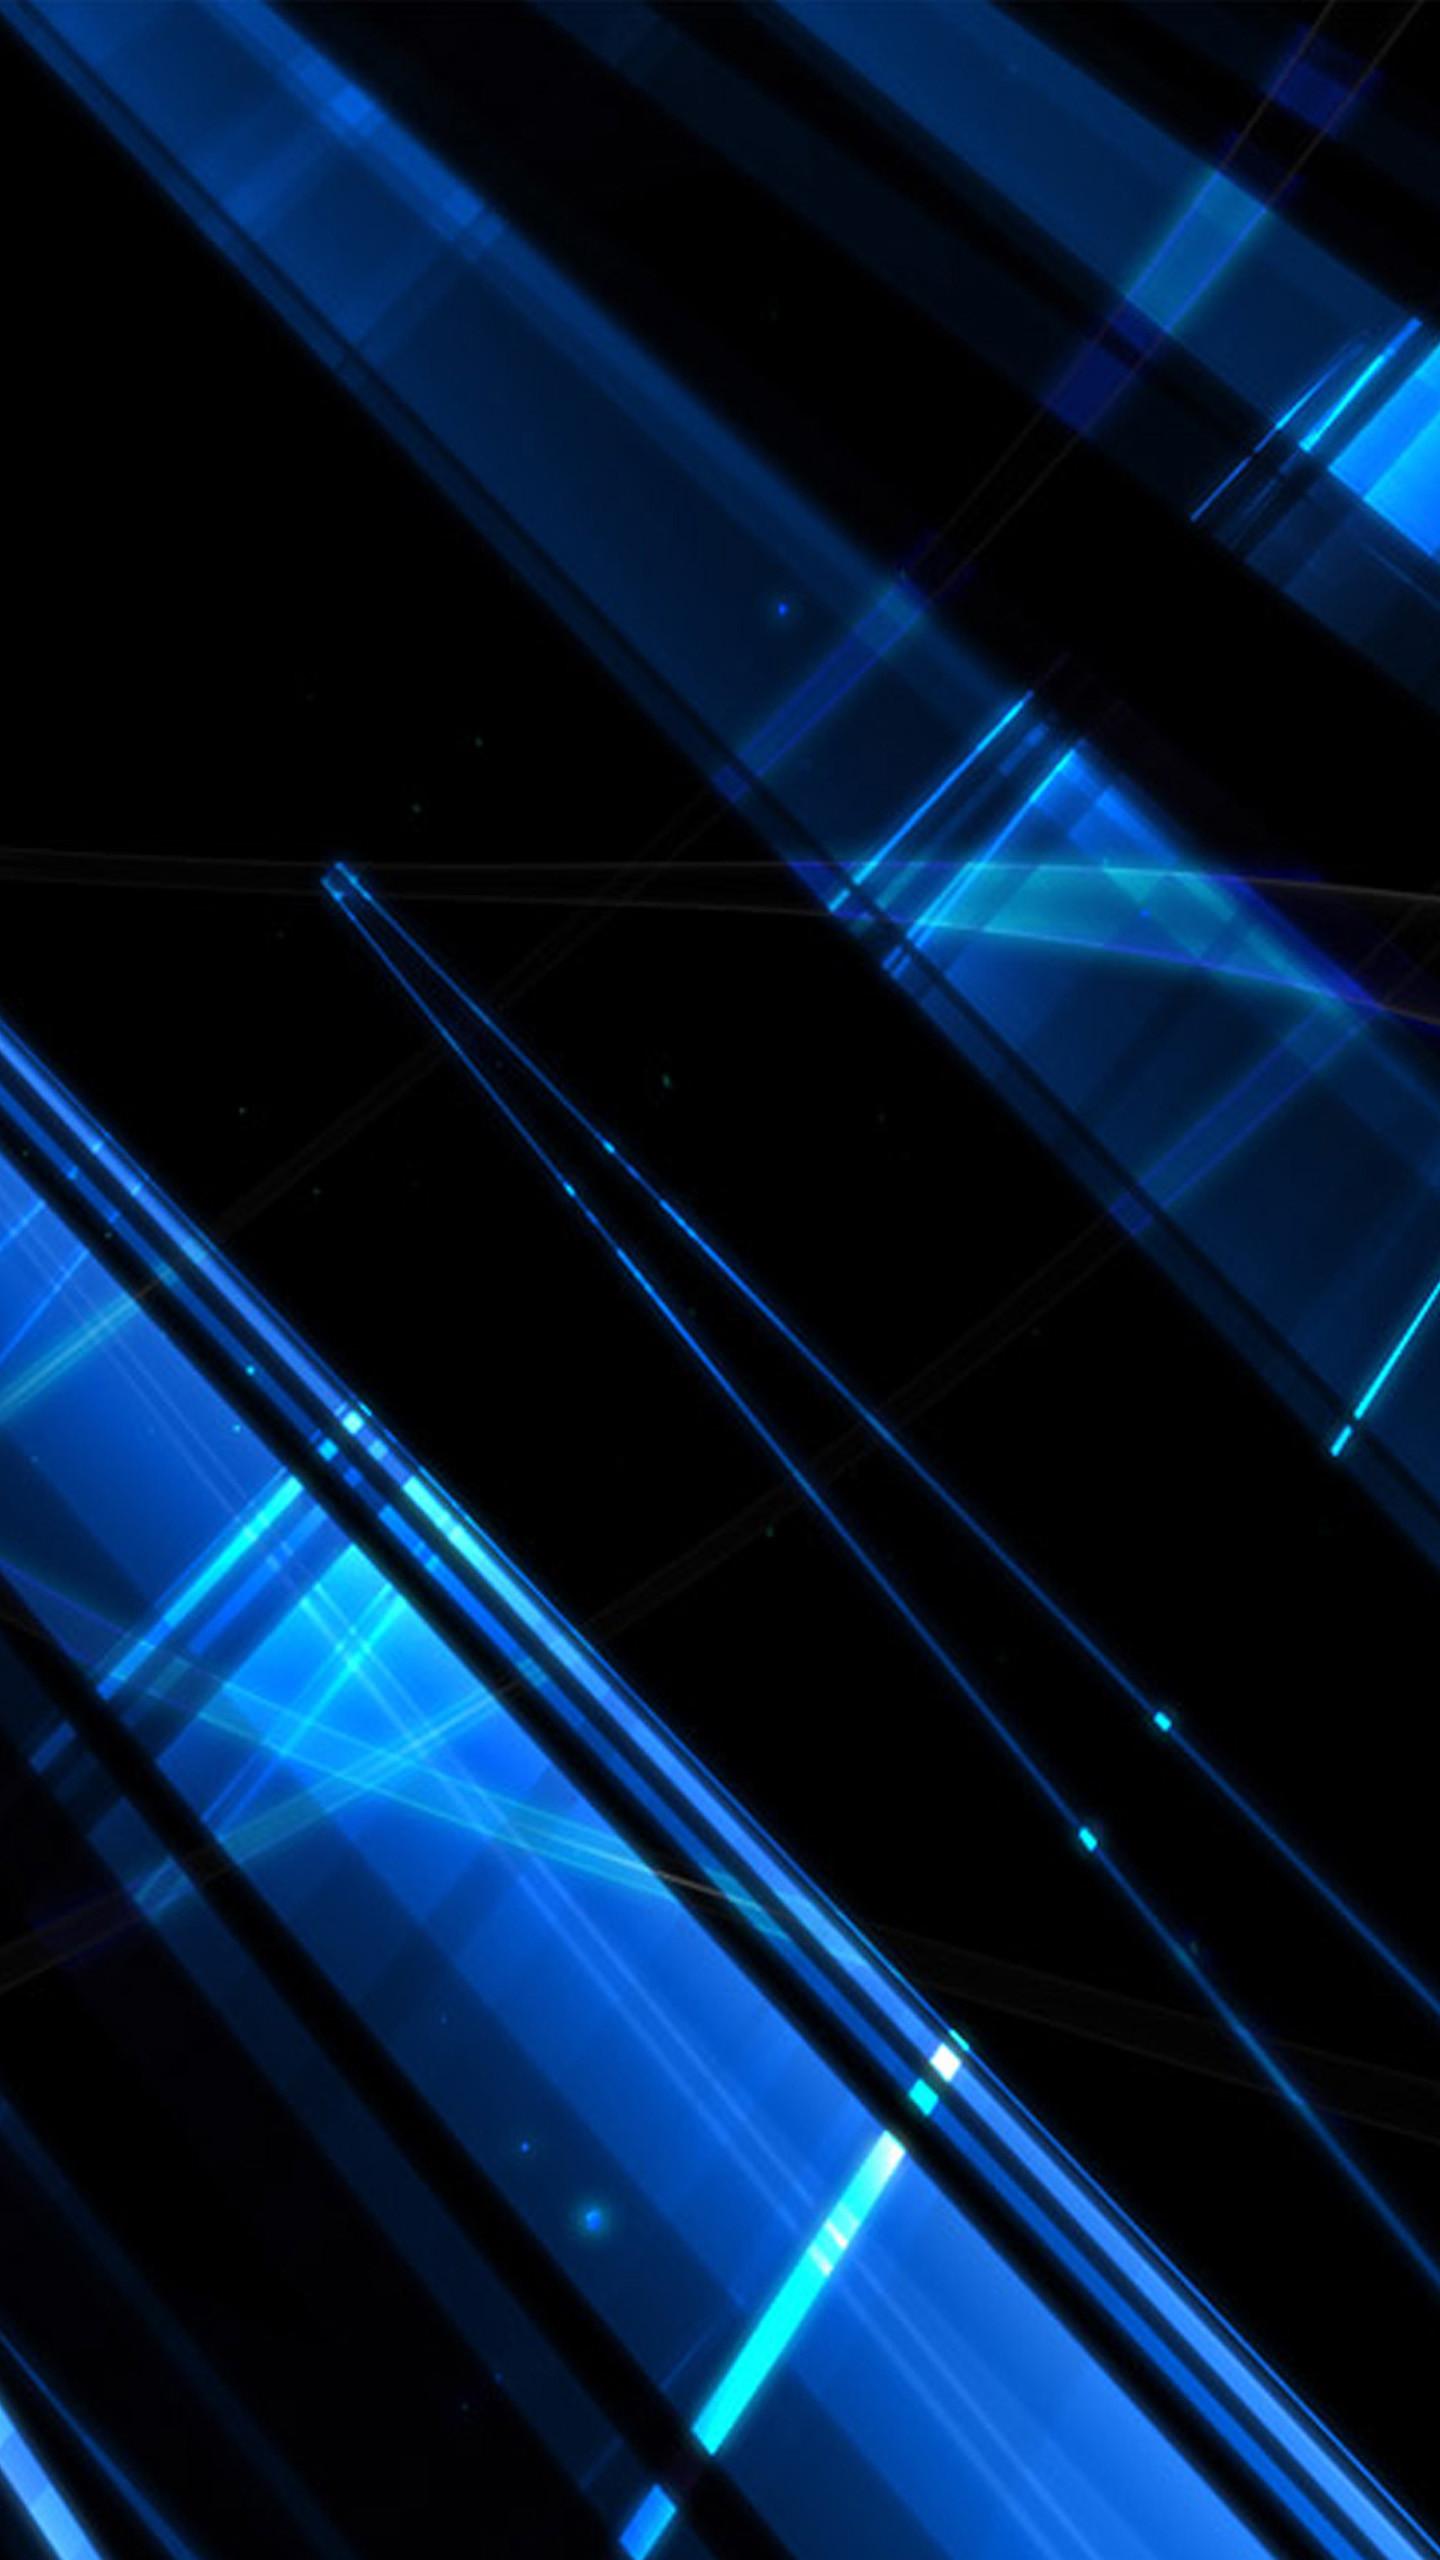 Res: 1440x2560, Blue angel Nexus 6 Wallpapers, Nexus 6 wallpapers and Backgrounds